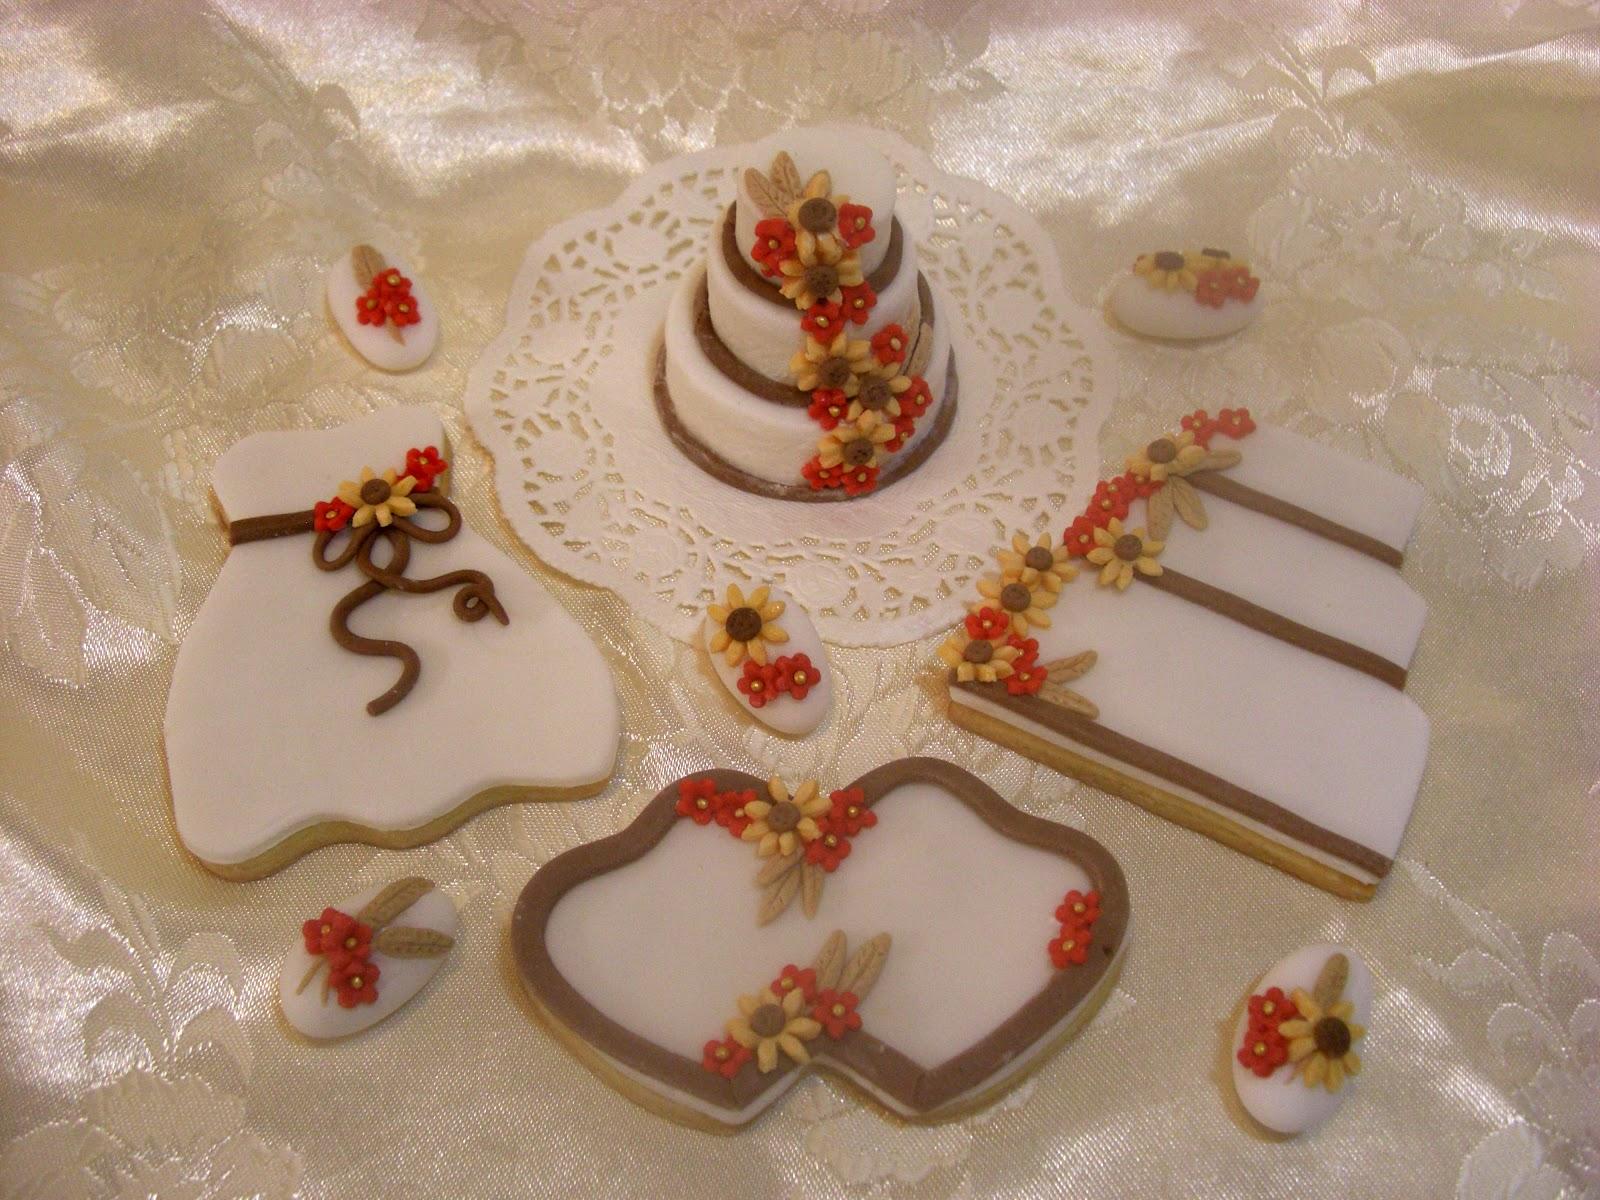 Matrimonio Tema Grano : Elisa giovannetti cake designer wedding kit girasoli